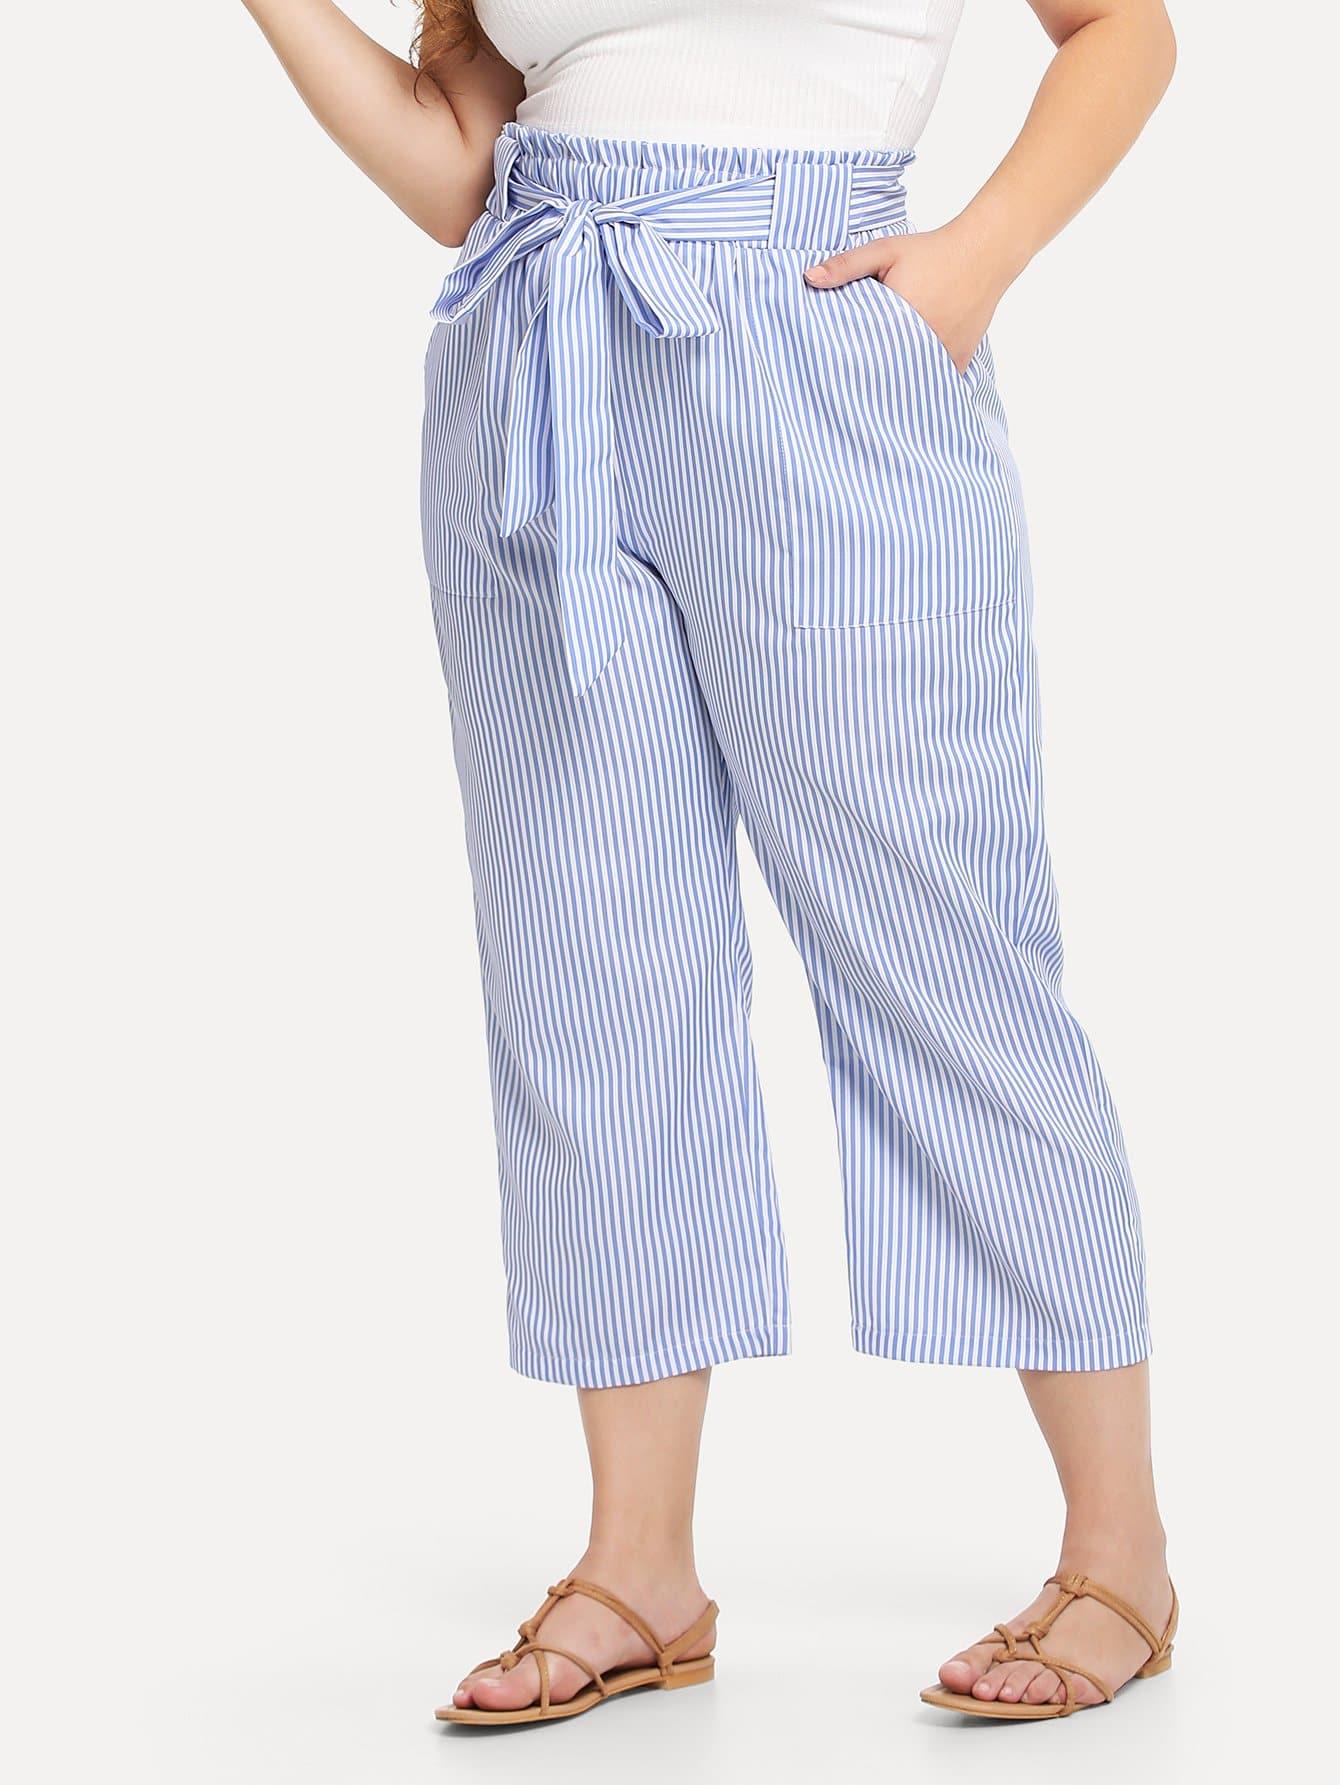 Self Tie Waist Striped Pants striped self tie waist dress